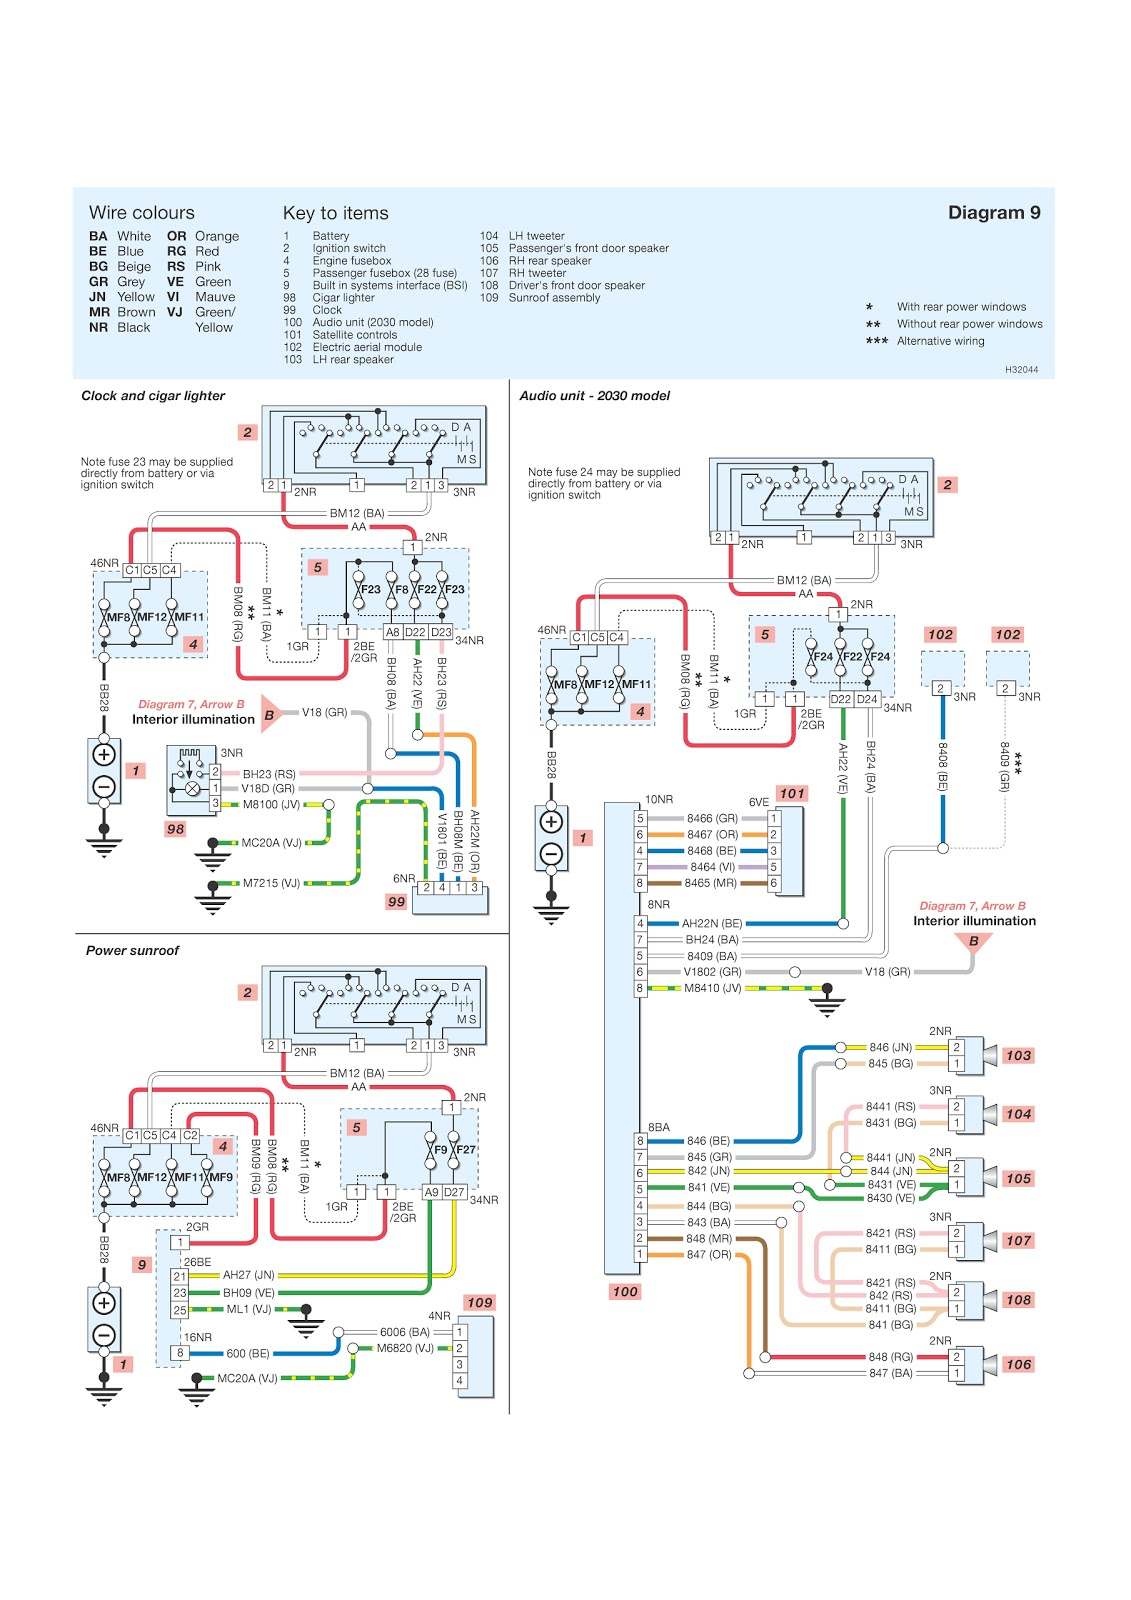 medium resolution of peugeot 206 multiplex wiring diagram wiring diagram database peugeot 206 wiring diagram 11